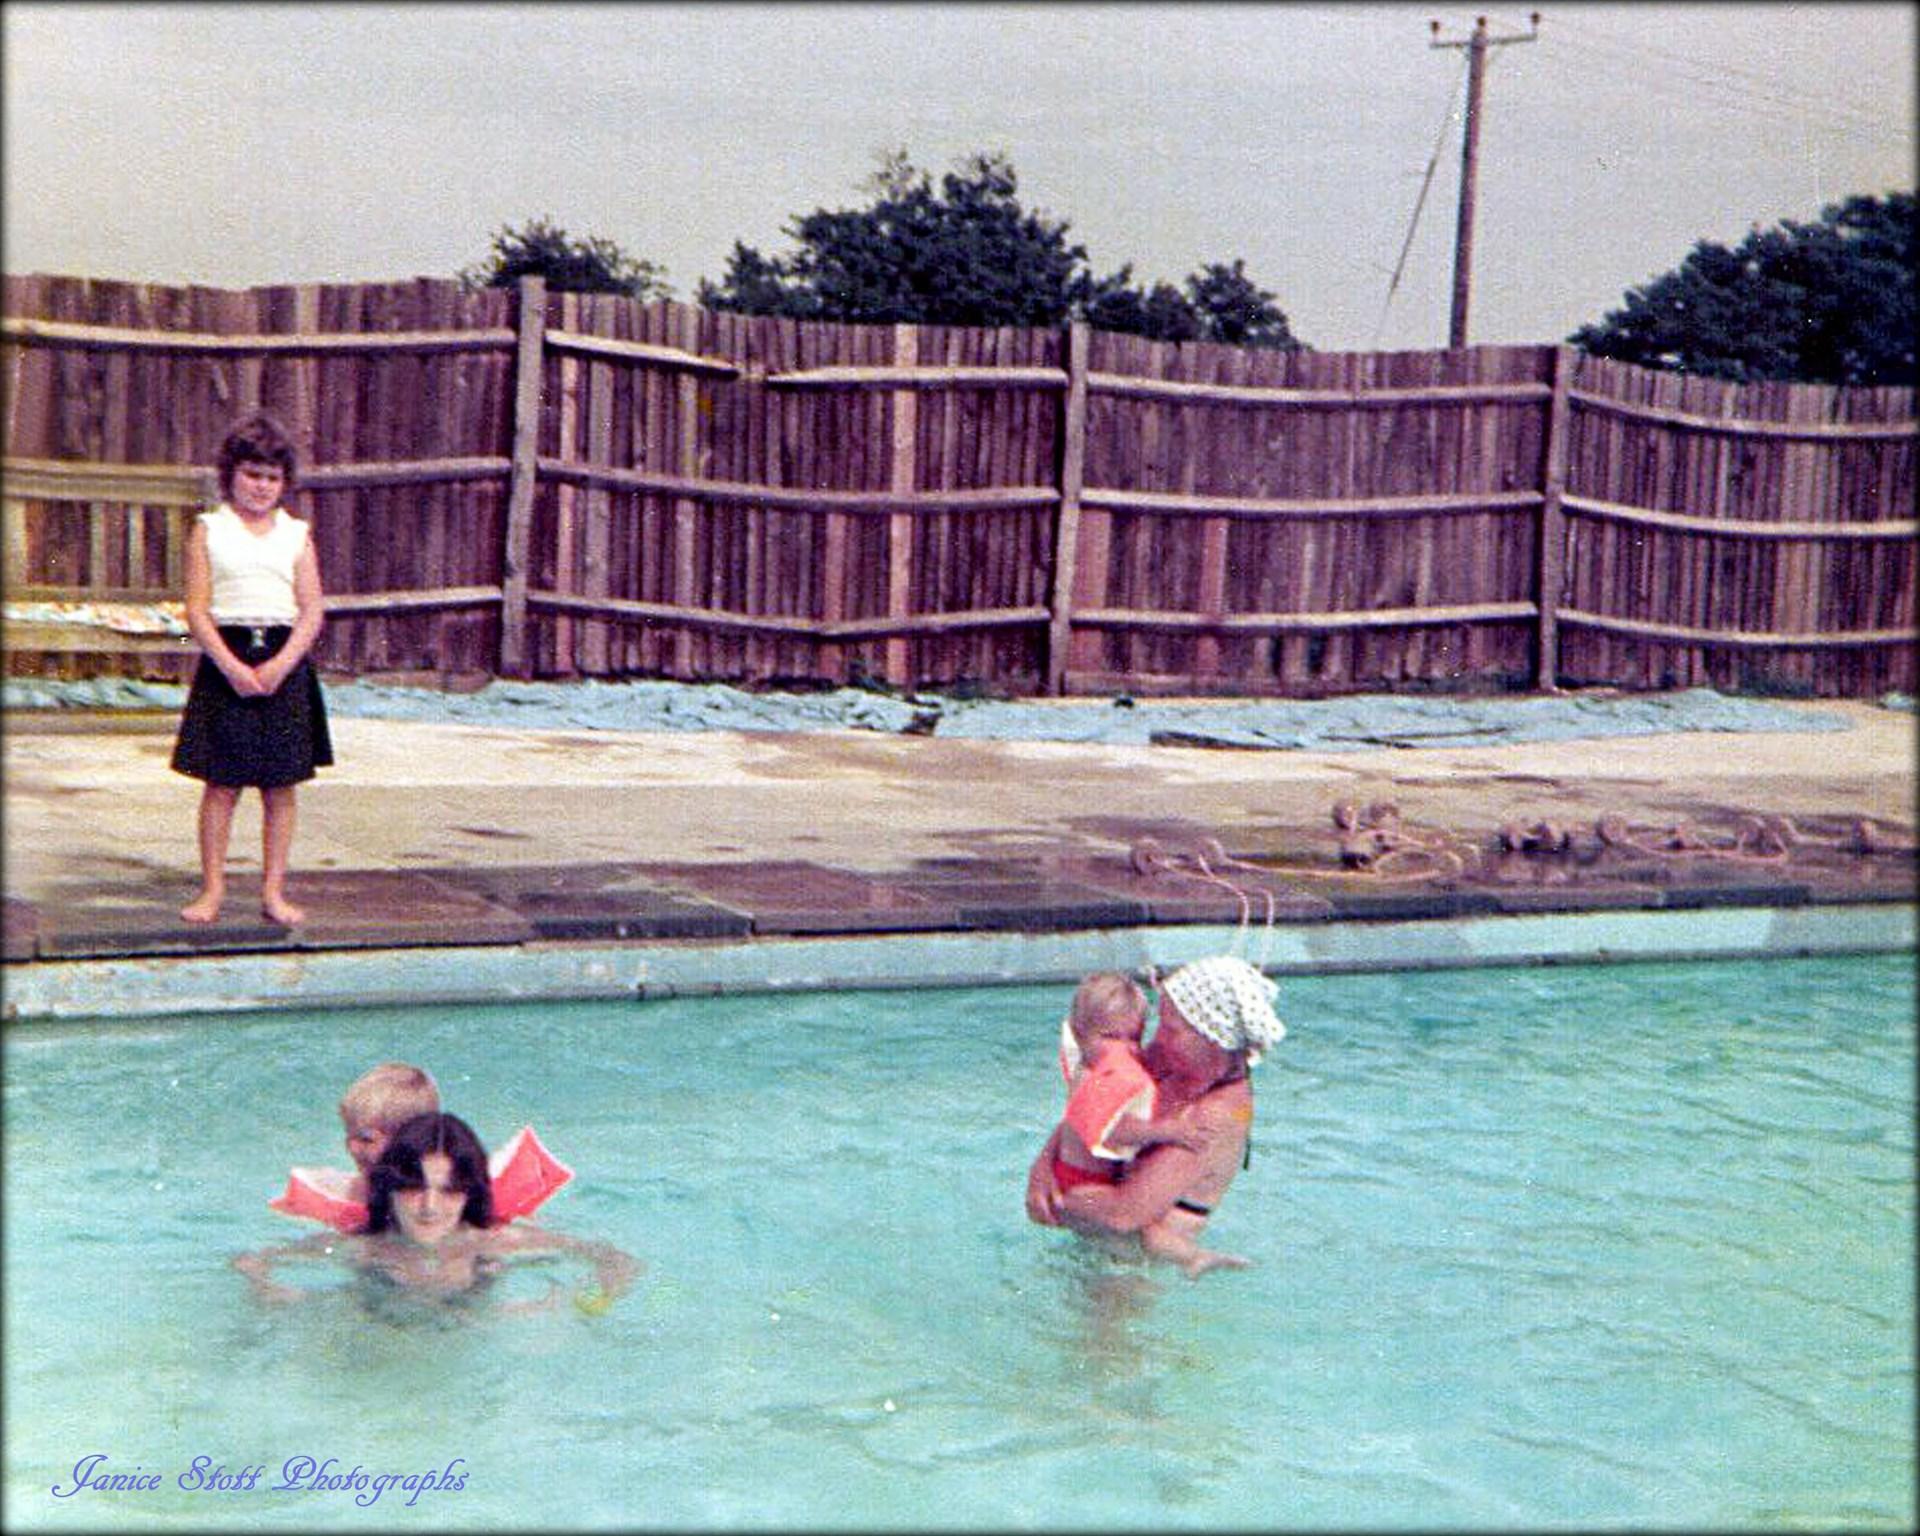 1970s Lordsfield Swimming Club Overton Basingstoke